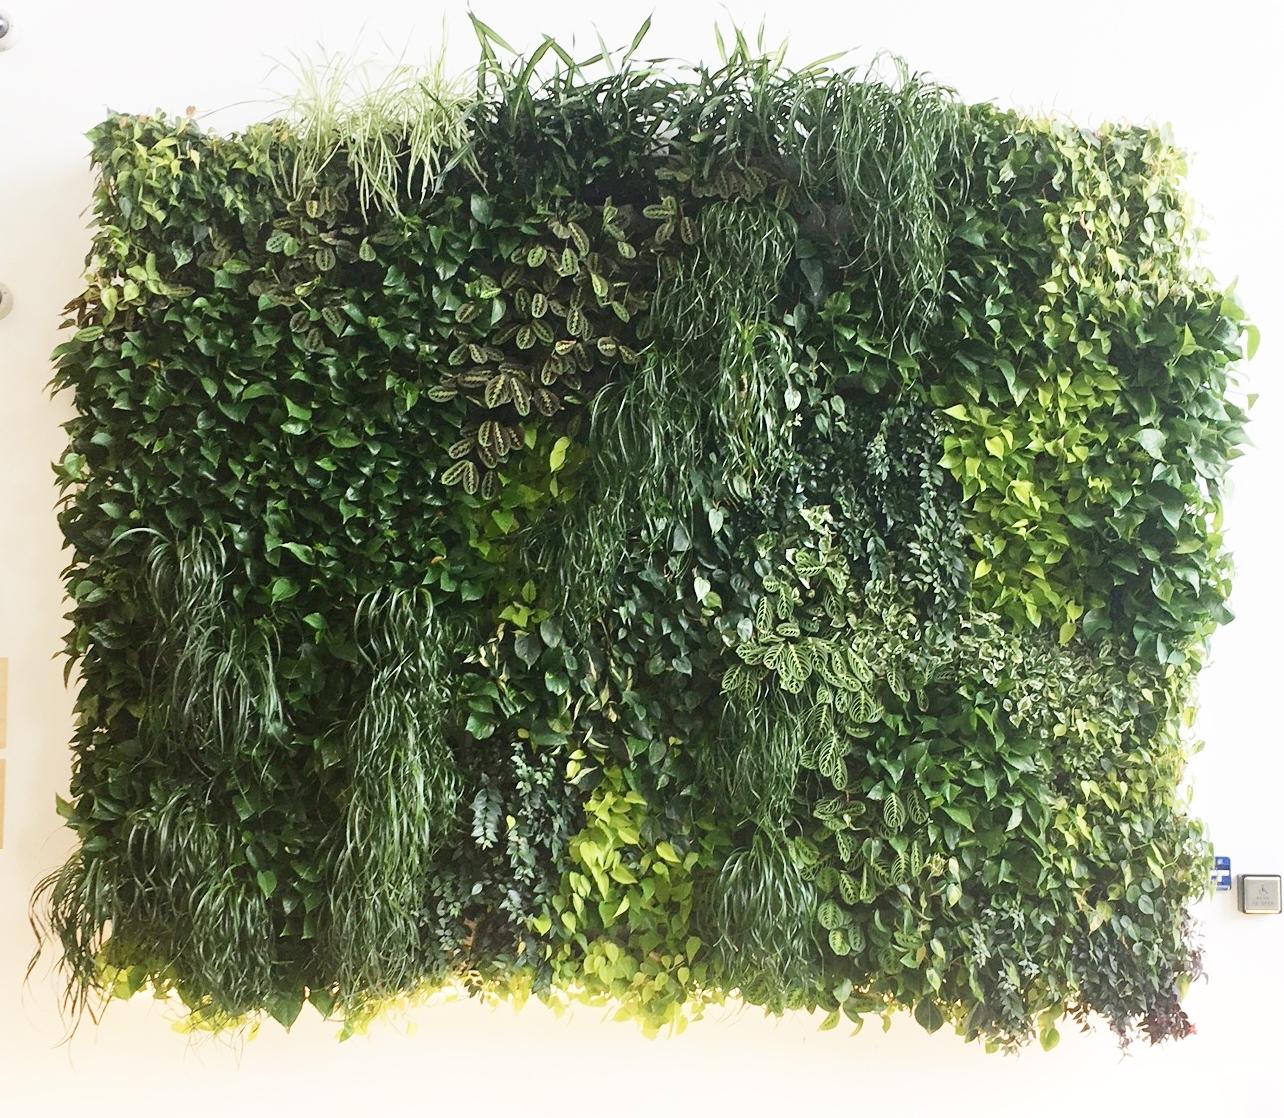 Here's my vertical garden inspiration.